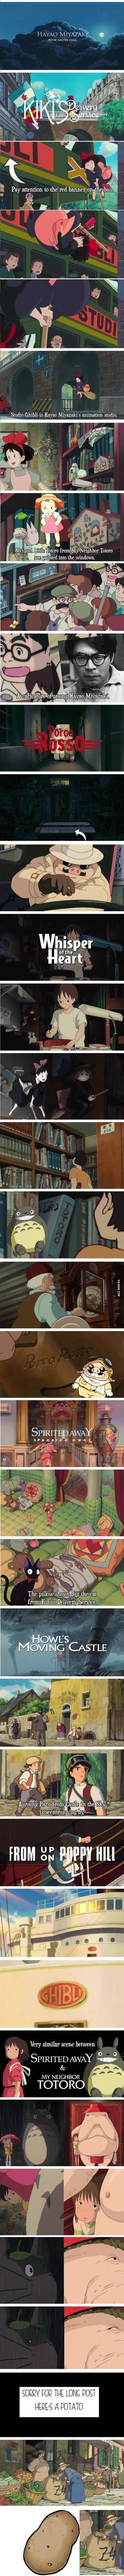 Here Are The Easter Eggs Hayao Miyazaki Has Hidden In His Movies. (Studio Ghibli)